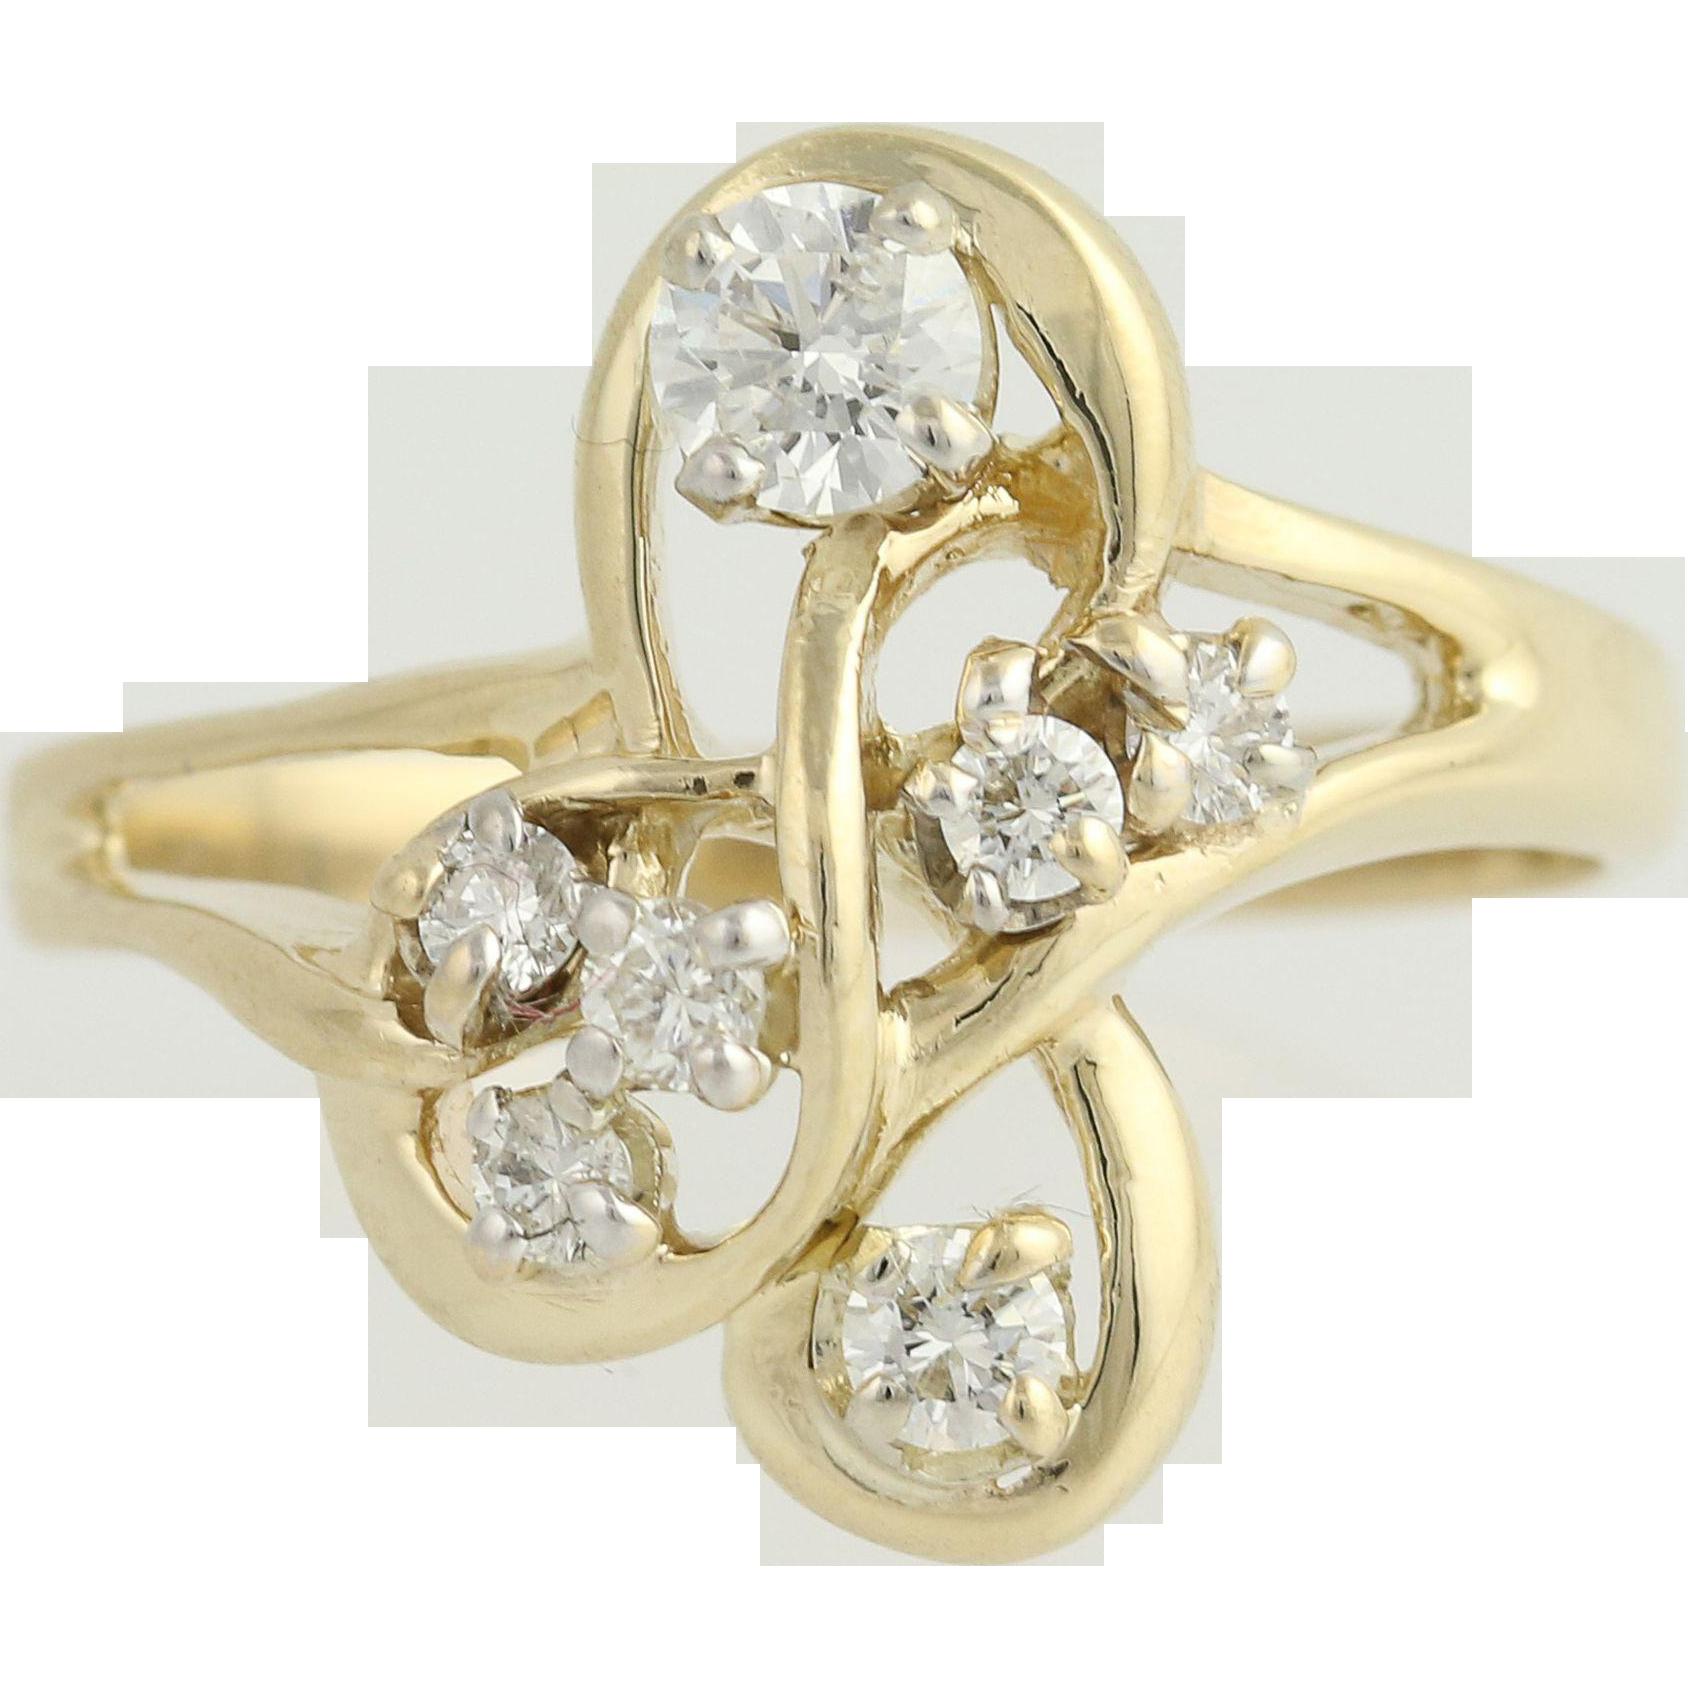 Diamond Ring - 14k Yellow & White Gold Bypass Women's .57ctw